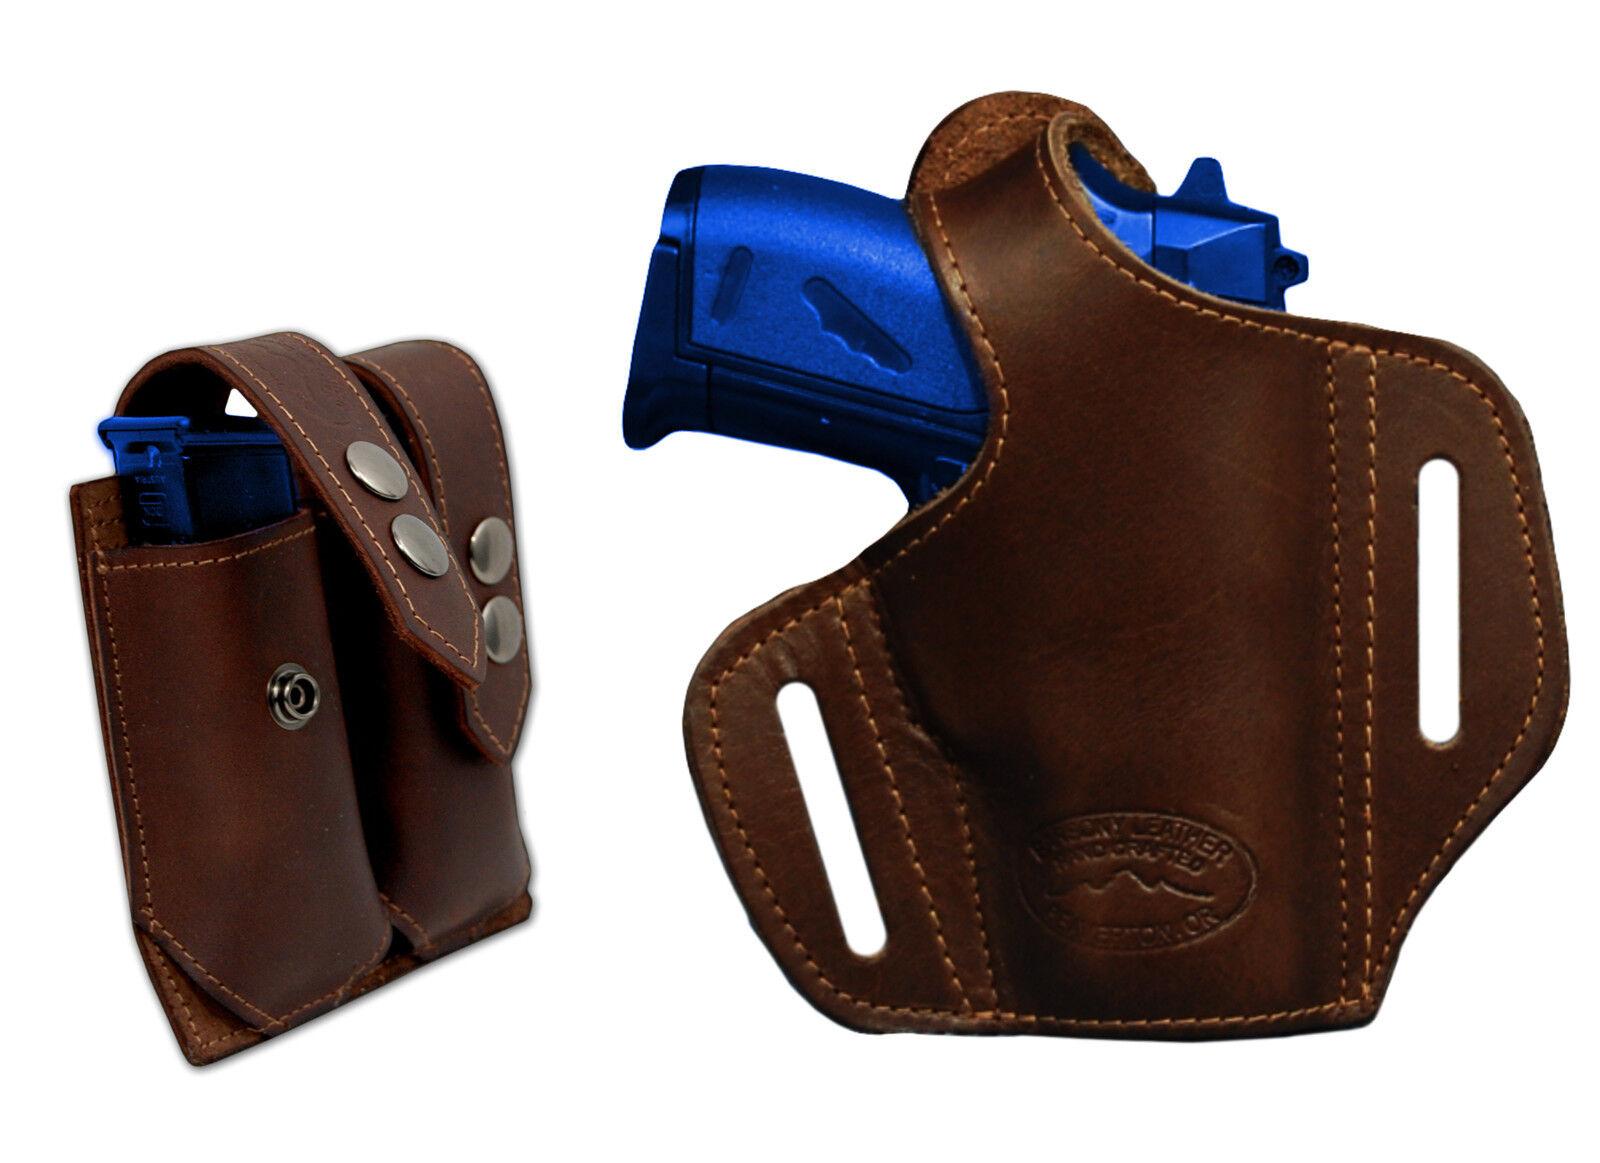 NEW Barsony marrón Leather Pancake Gun Holster + Mag Pouch Beretta Mini 22 25 380